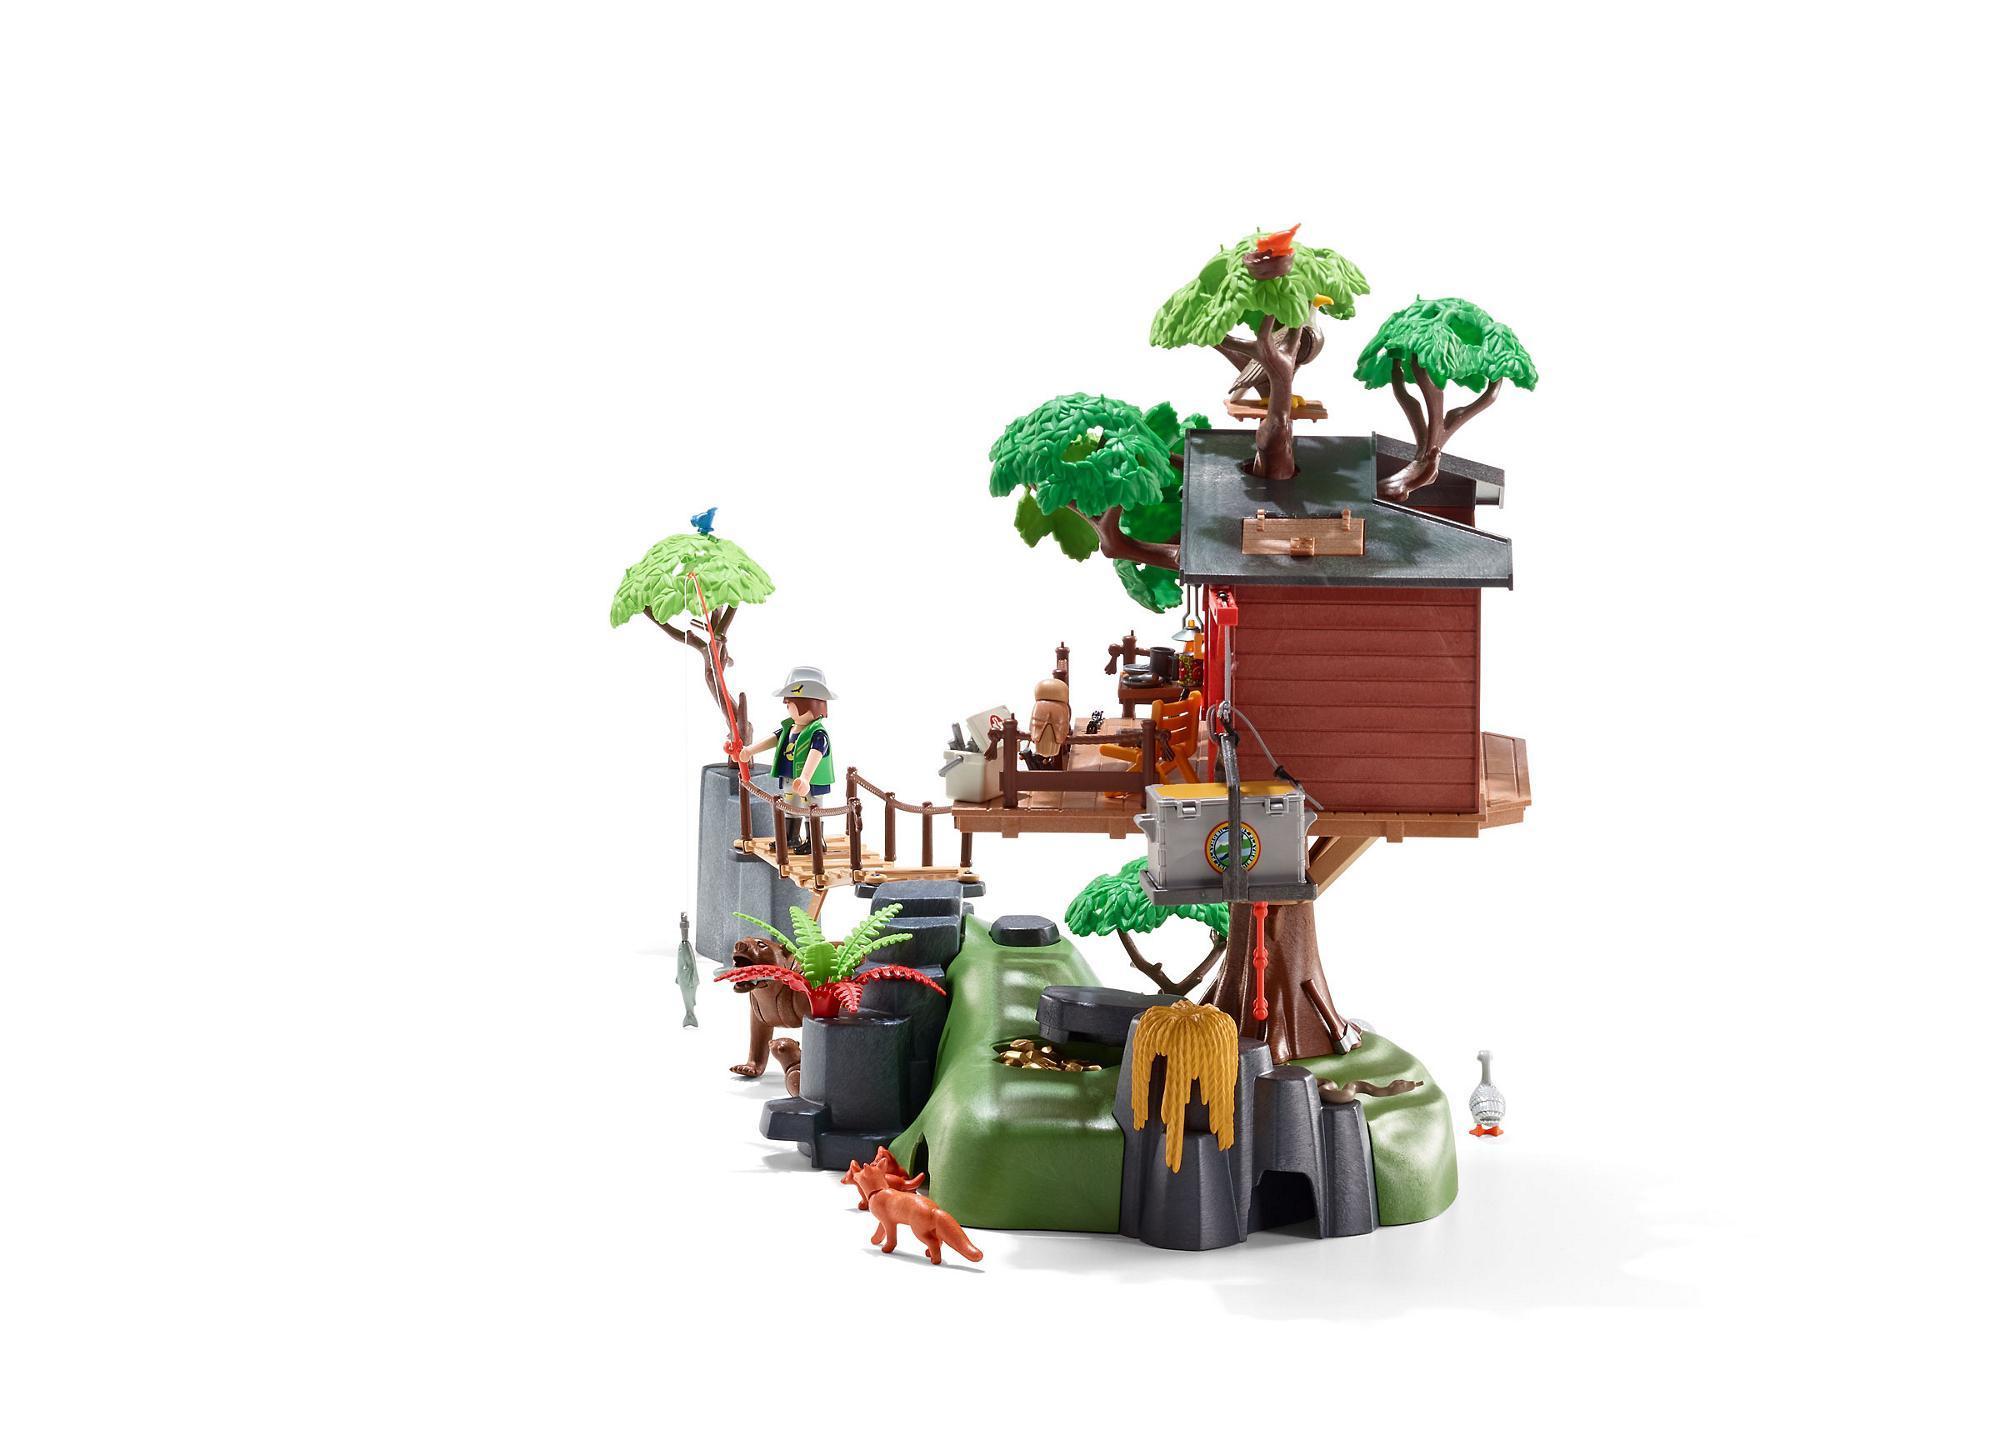 Ausmalbilder Playmobil Top Agents Ausmalbilder Webpage